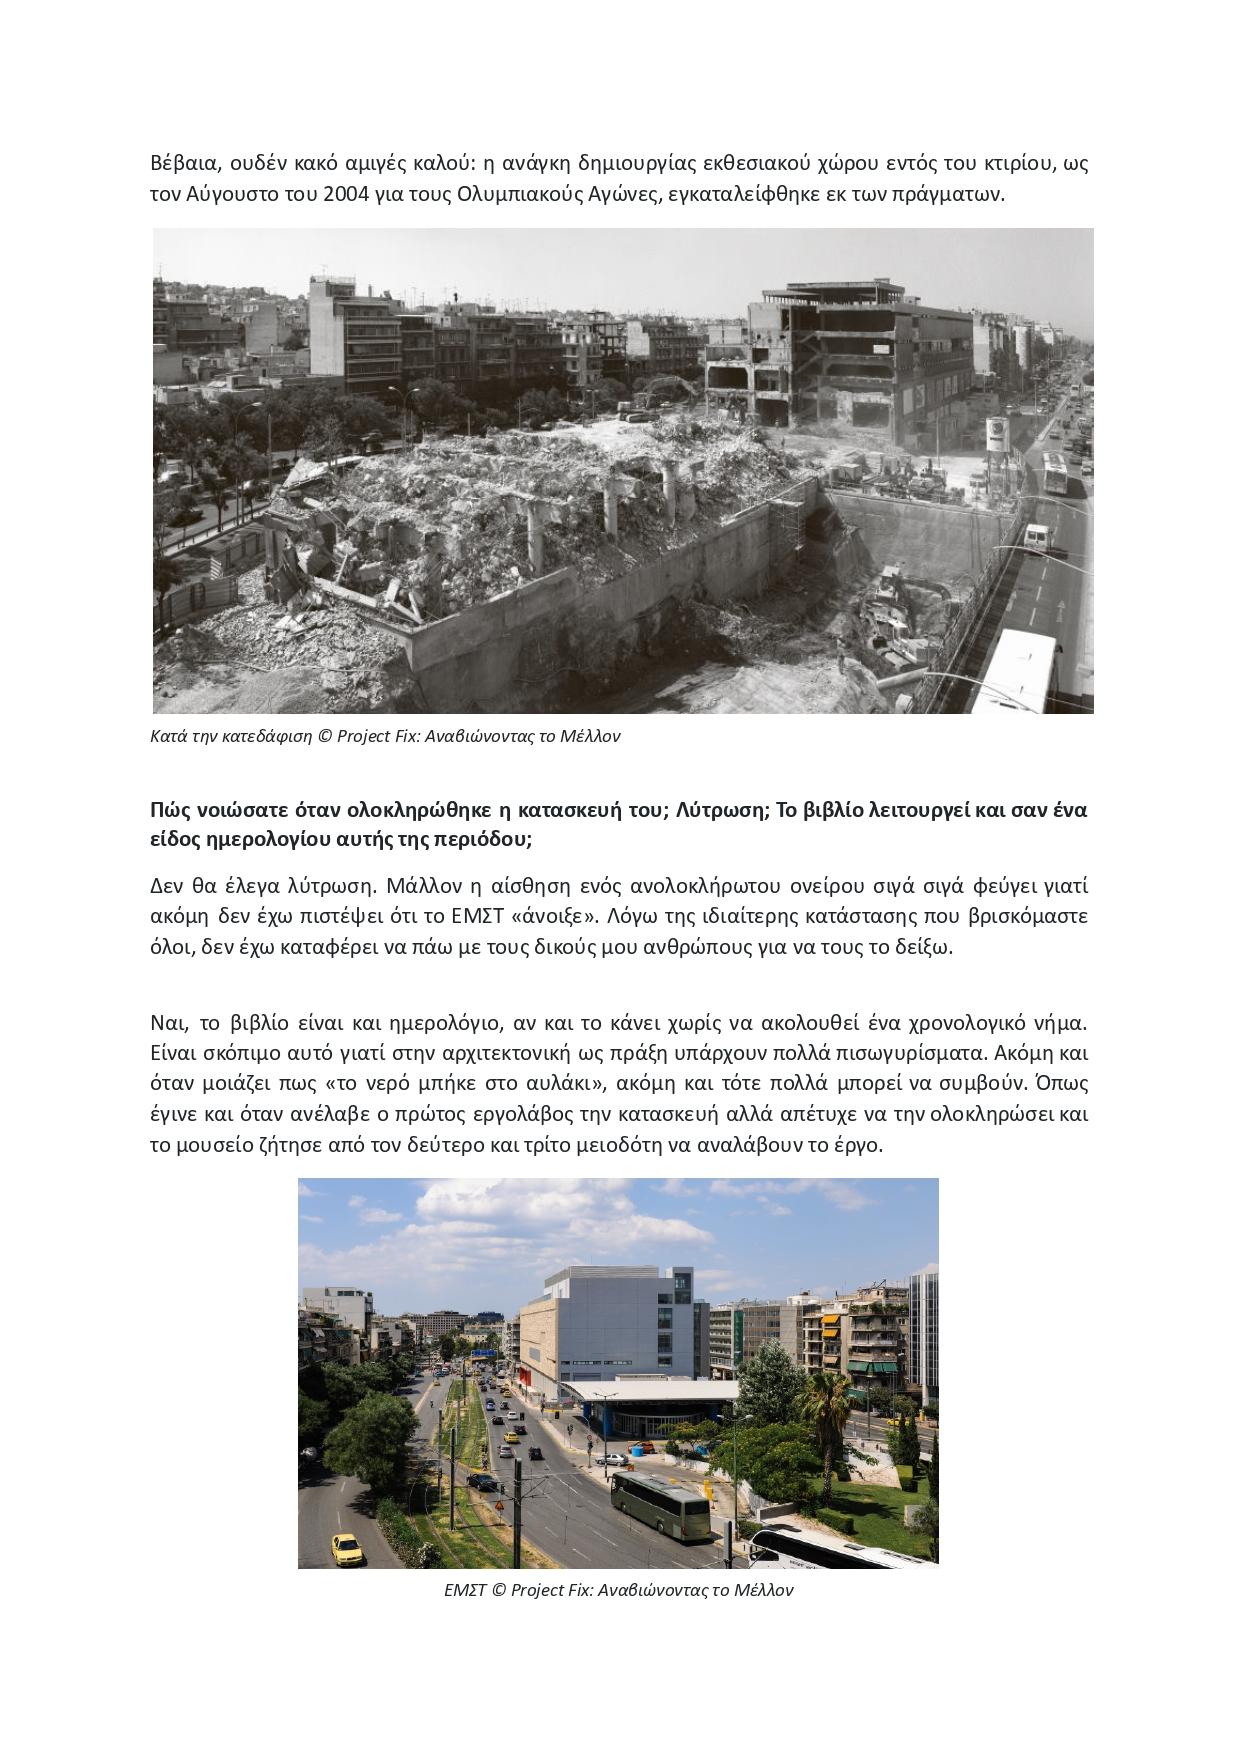 AthensVoice Kalliope Kontozoglou.docx - Google Docs_page-0004